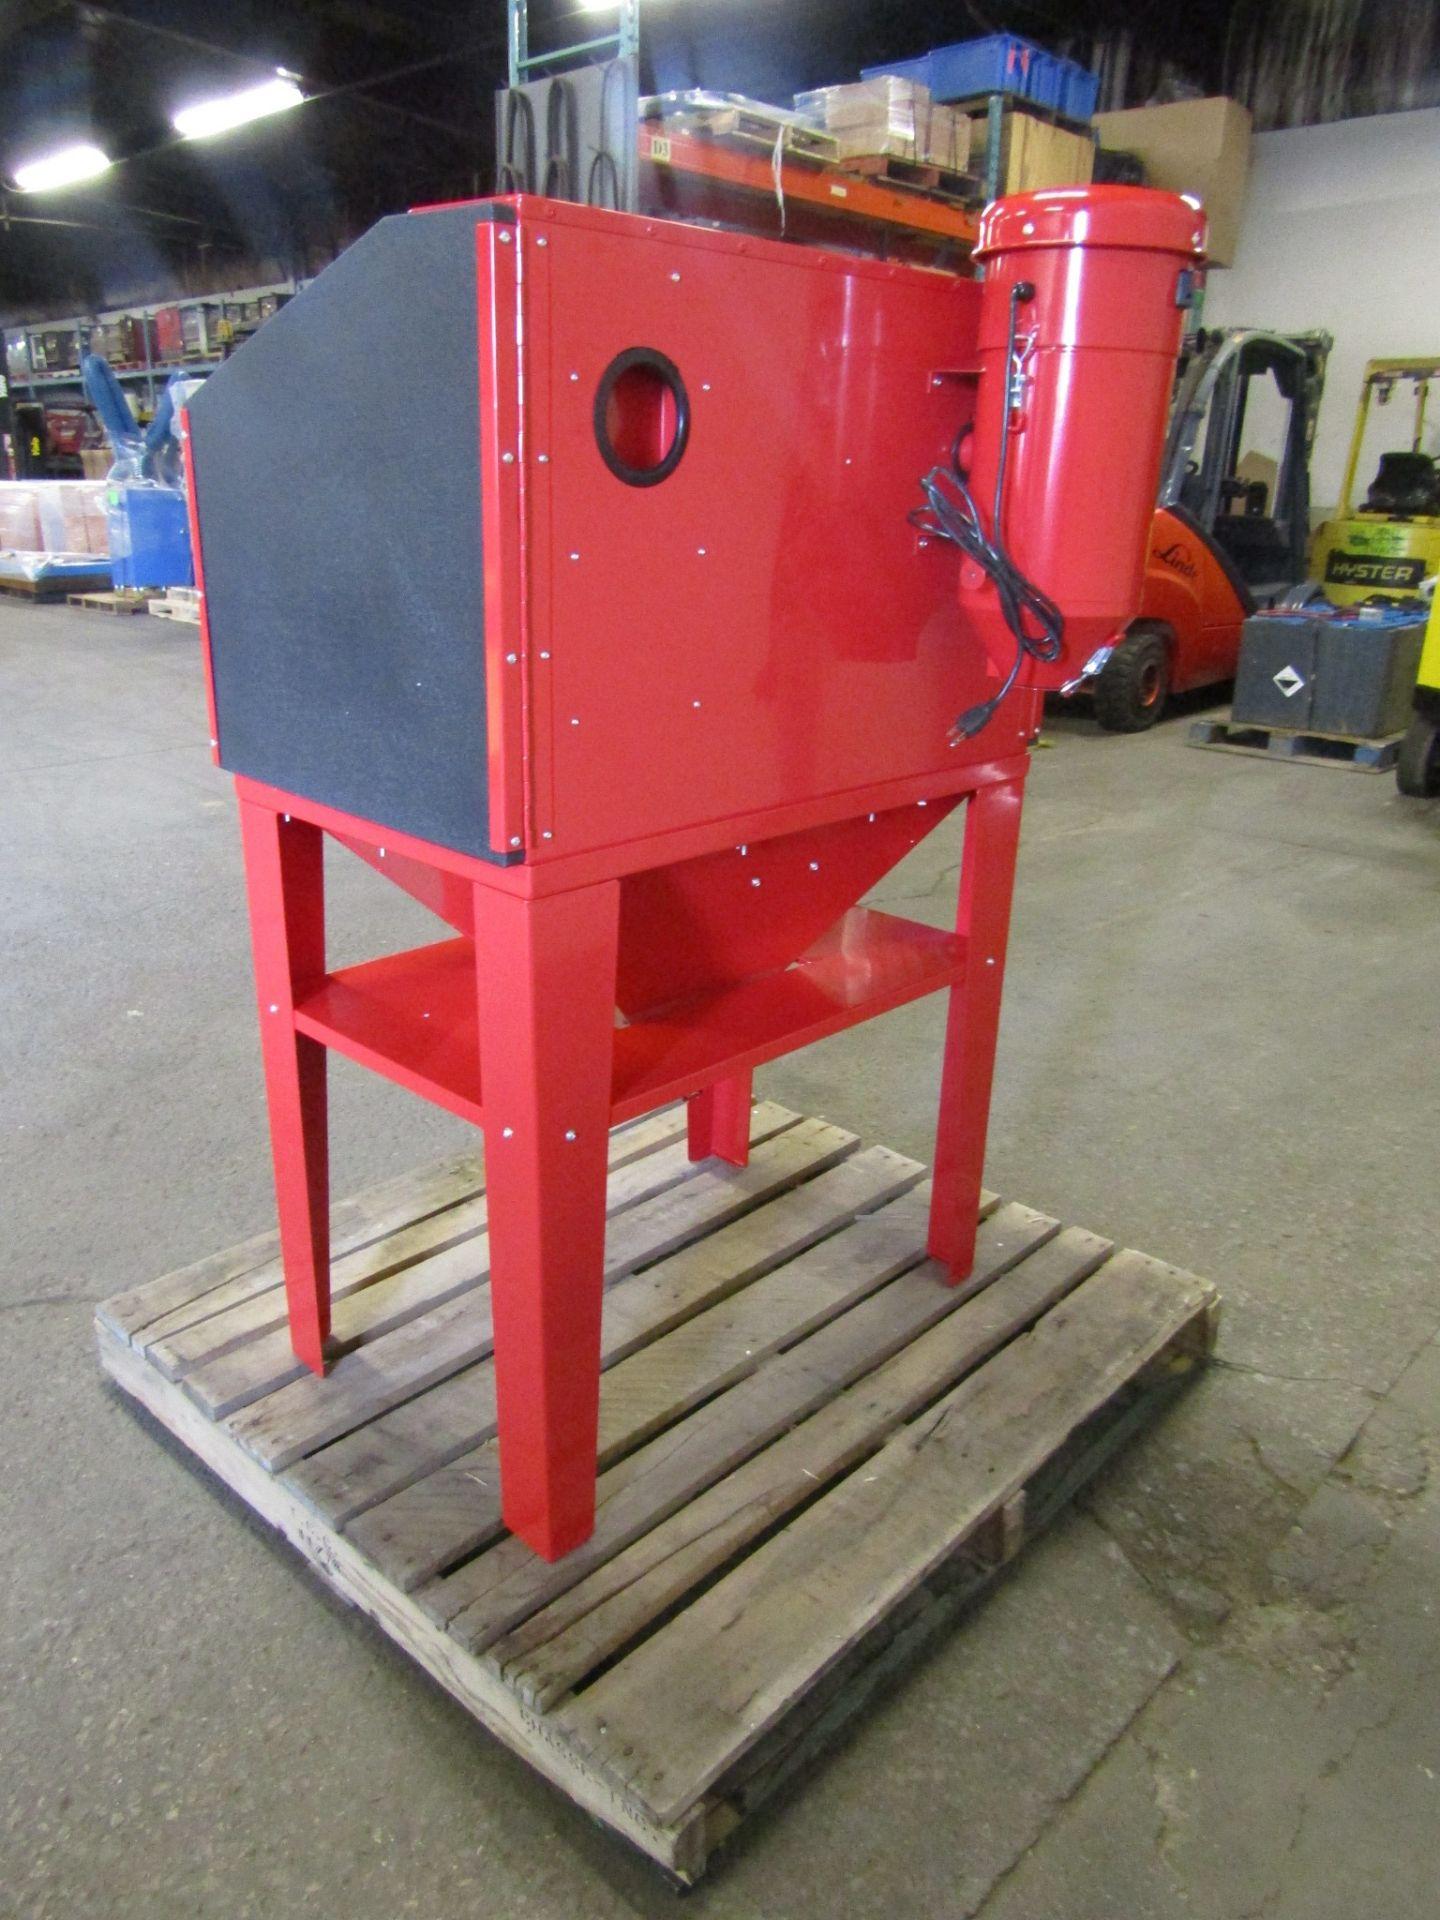 "BRAND NEW OMNI Sandblast Cabinet with Dust vacuum unit - 125PSI working space 24"" X 33"" X 25"" - Image 2 of 2"